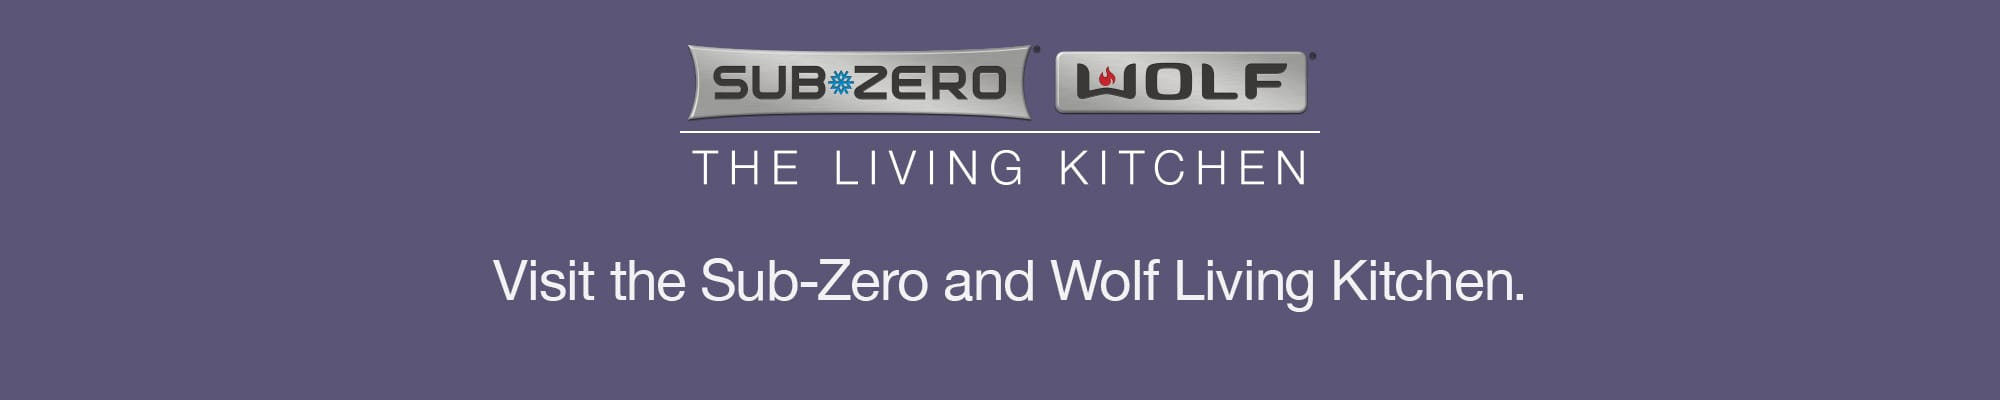 Sub Zero Wolf Visit the Living Kitchen and Logo